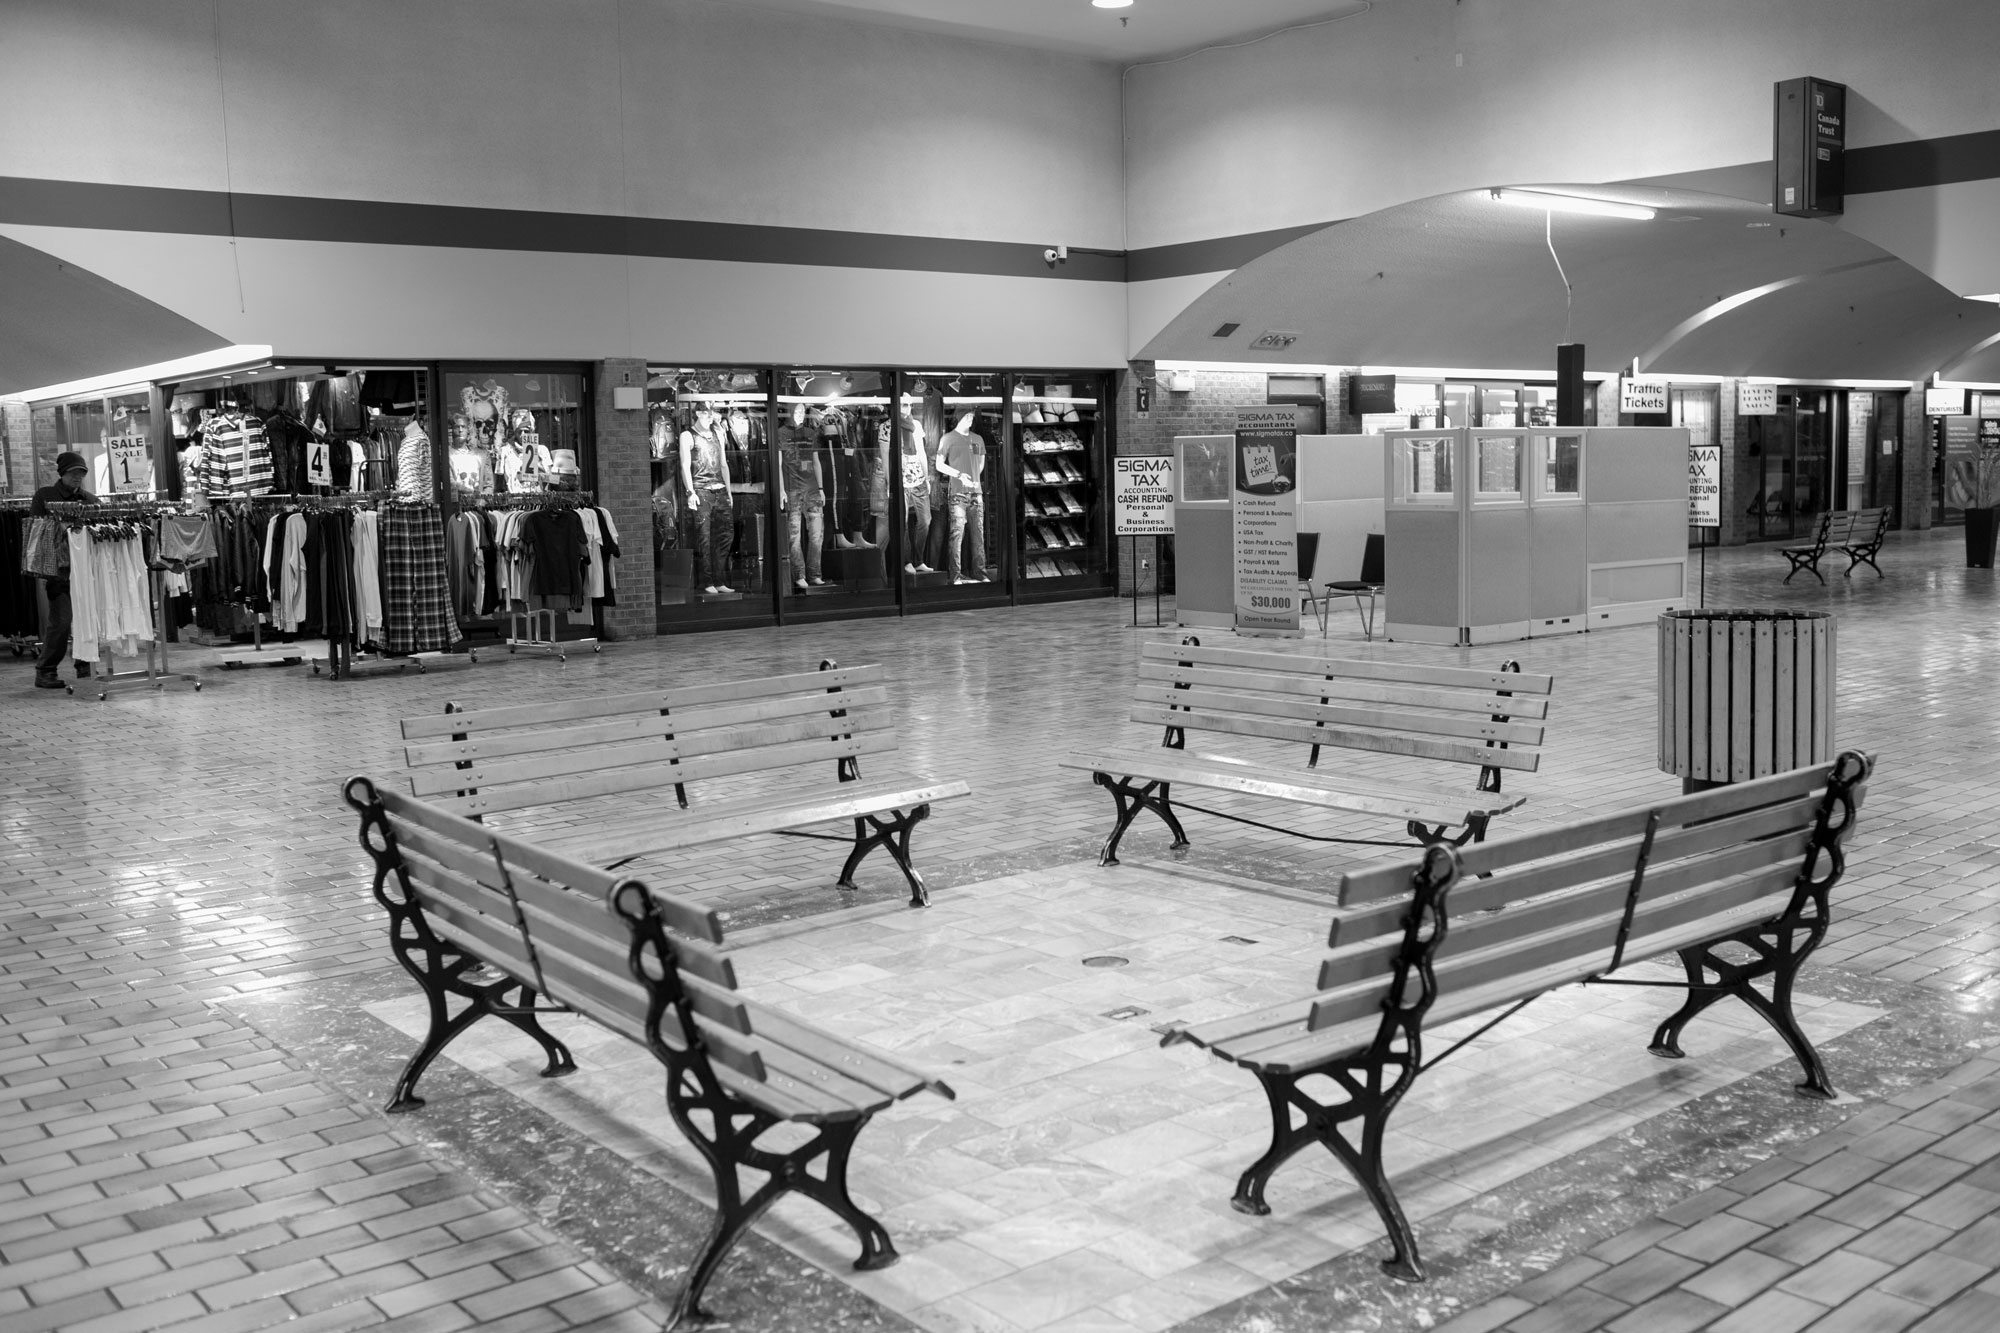 West-End-Phoenix-Feb2018-Galleria-Mall-Jeff-Harris-12.jpg